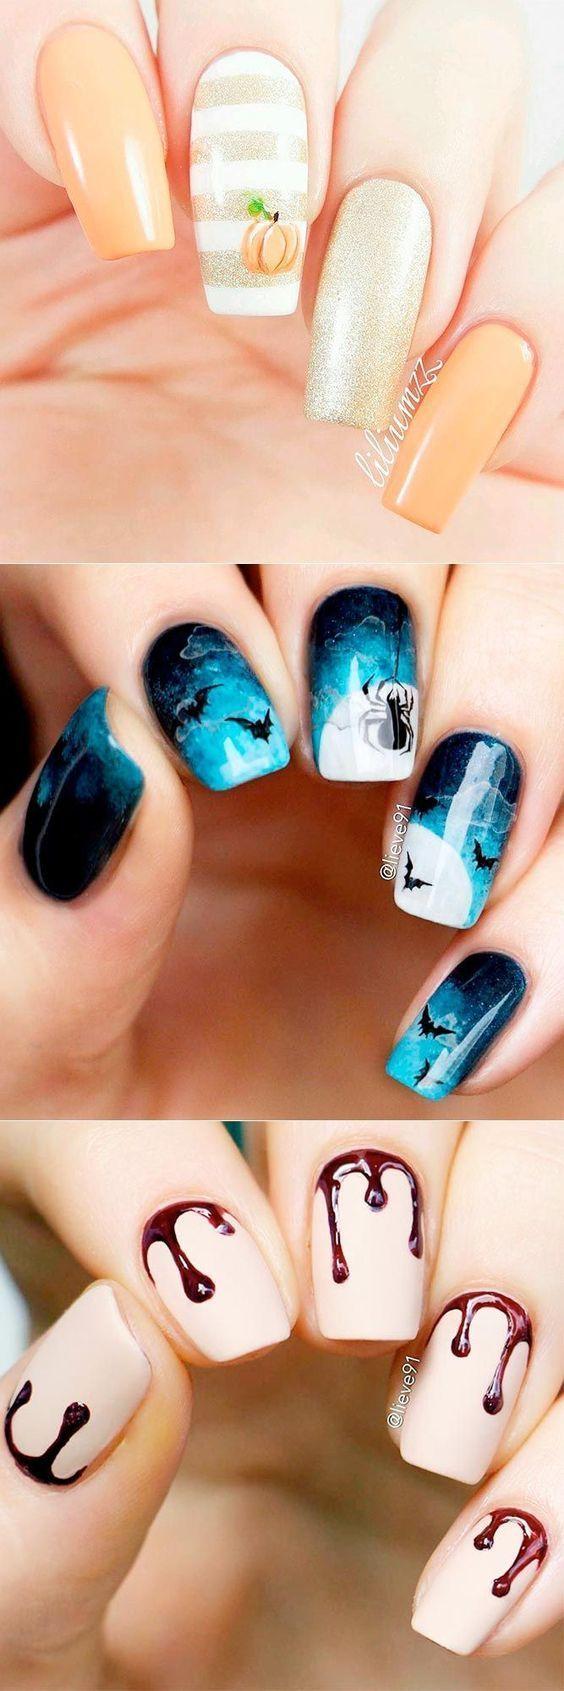 Fingernägel #nagellack #gelnägel #nageldesign #nägeldesign #prettynails #Nail – #Fingernägel #gelnägel #Nageldesign #Nagellack #Nail #prettynails